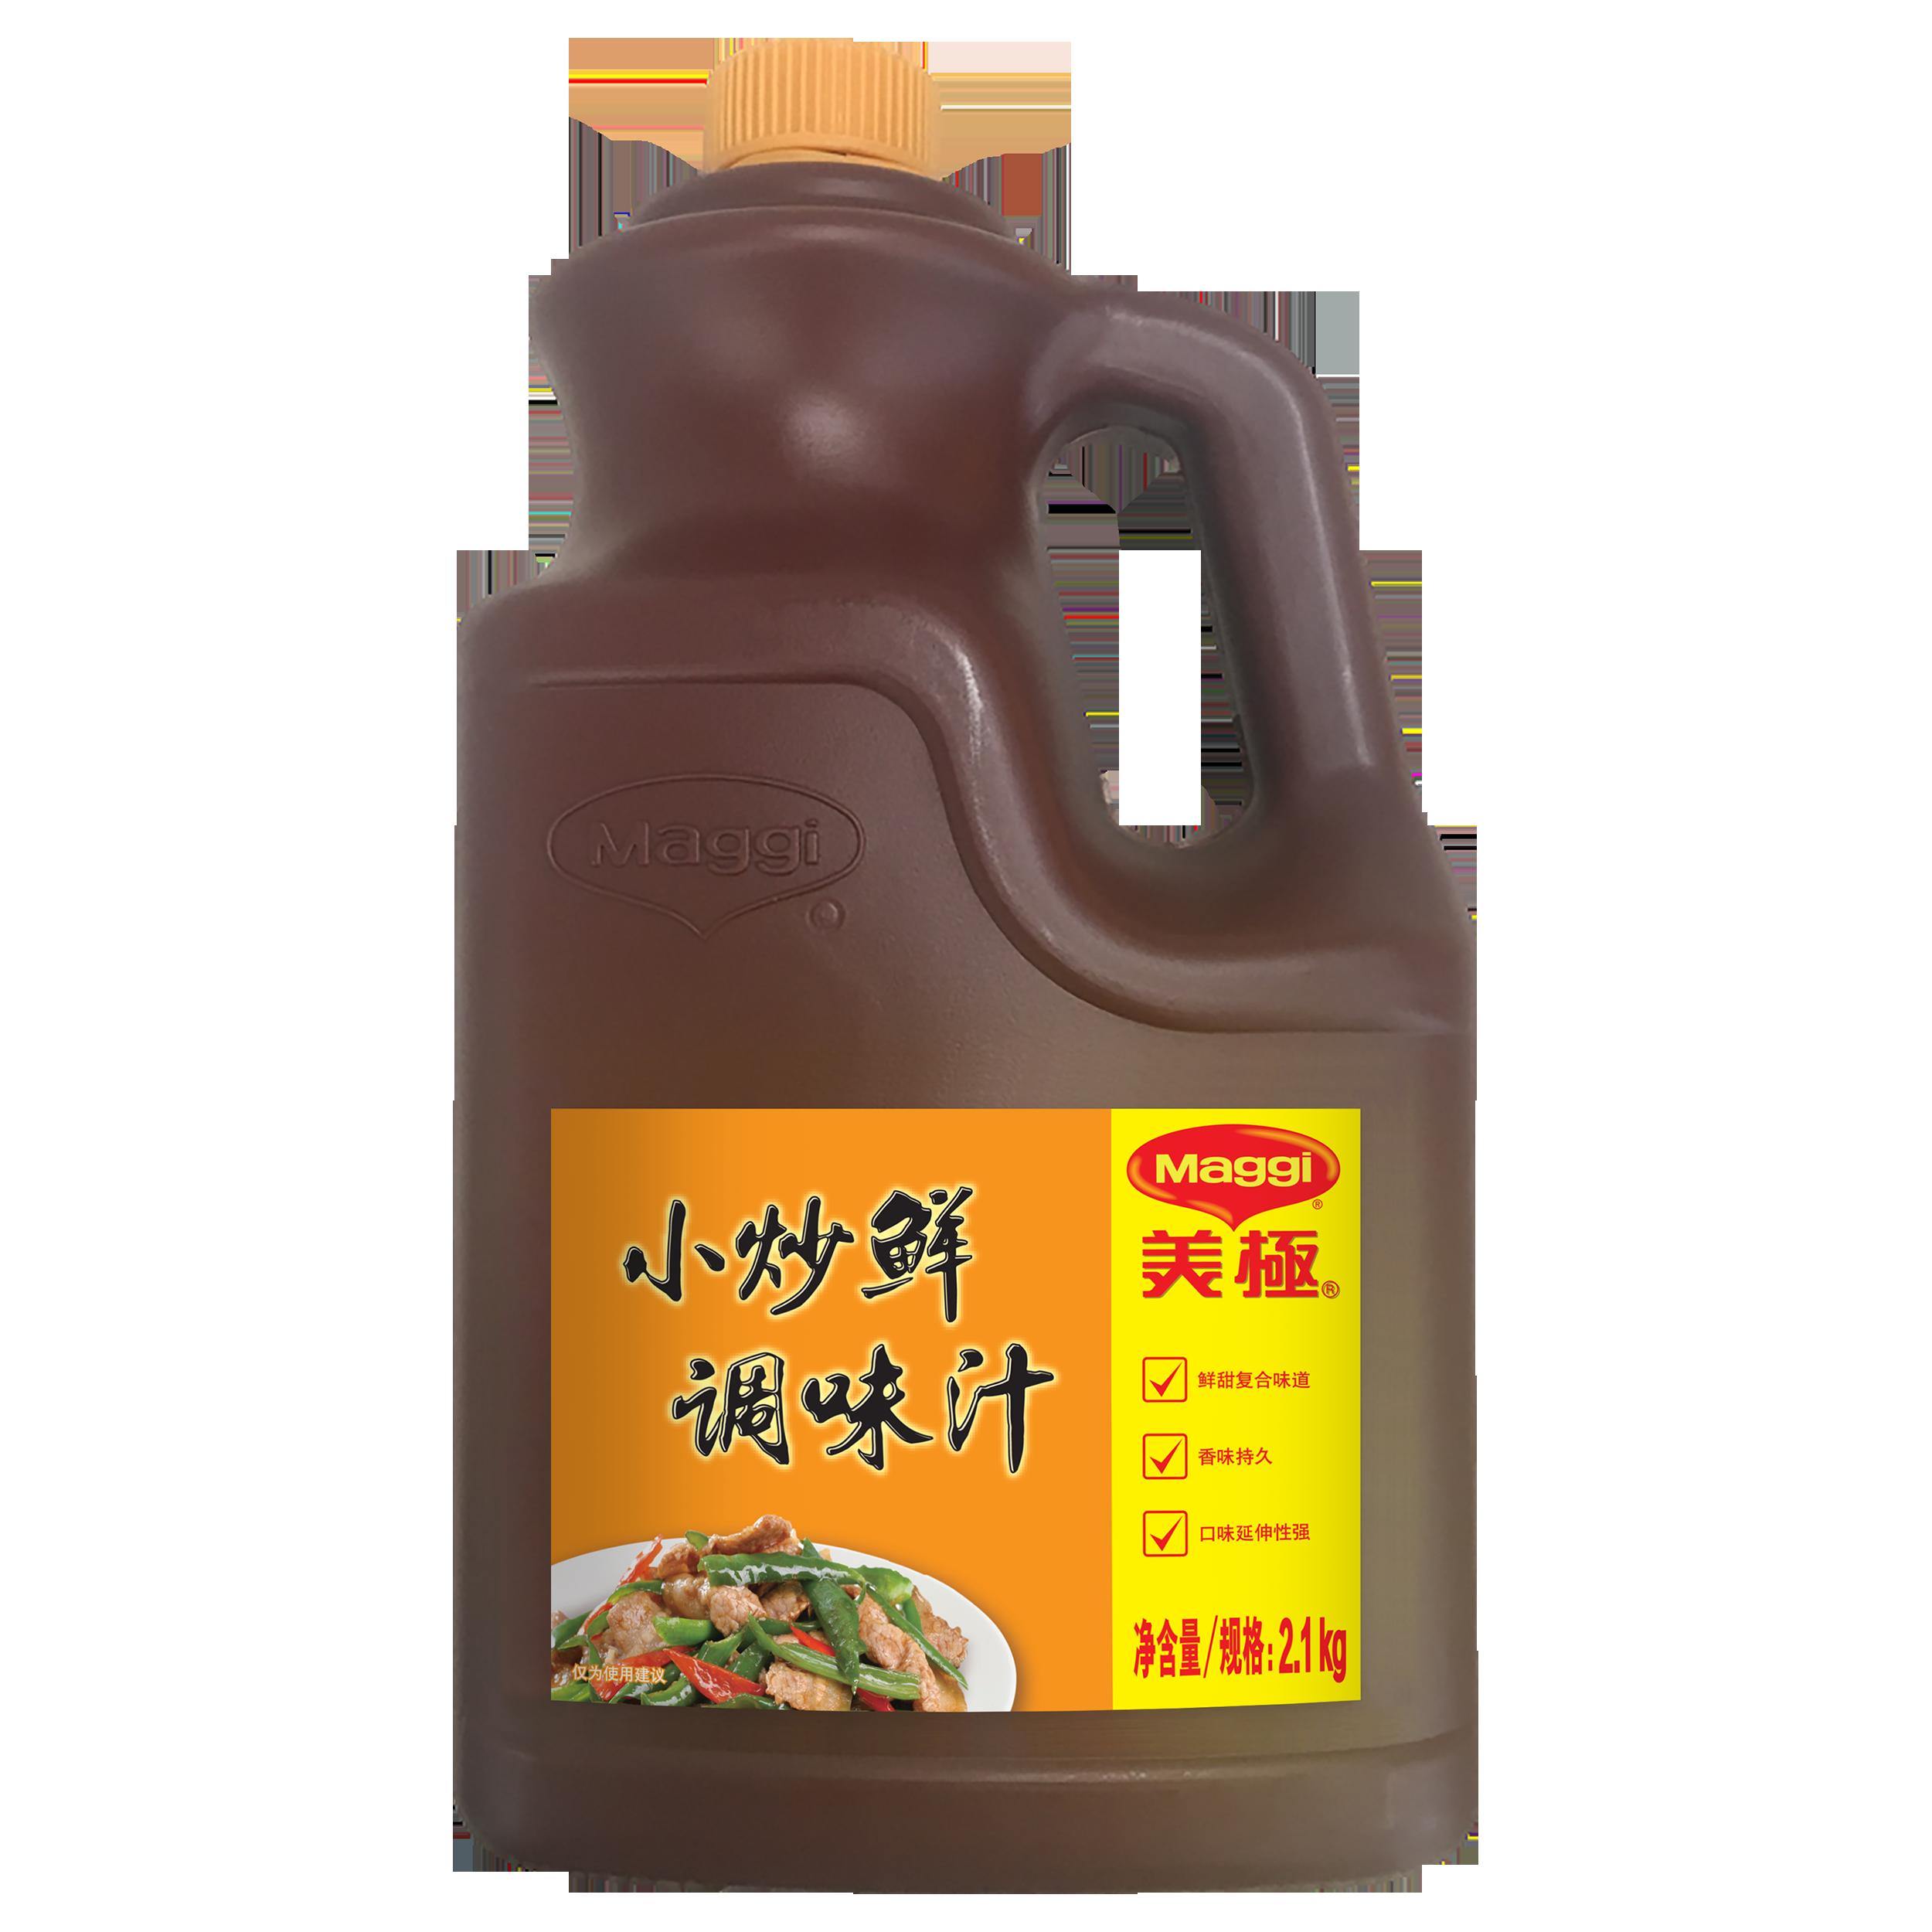 12391500 MAGGI TASTE OF ASIA Stir Frying Sauce_1.7L.png